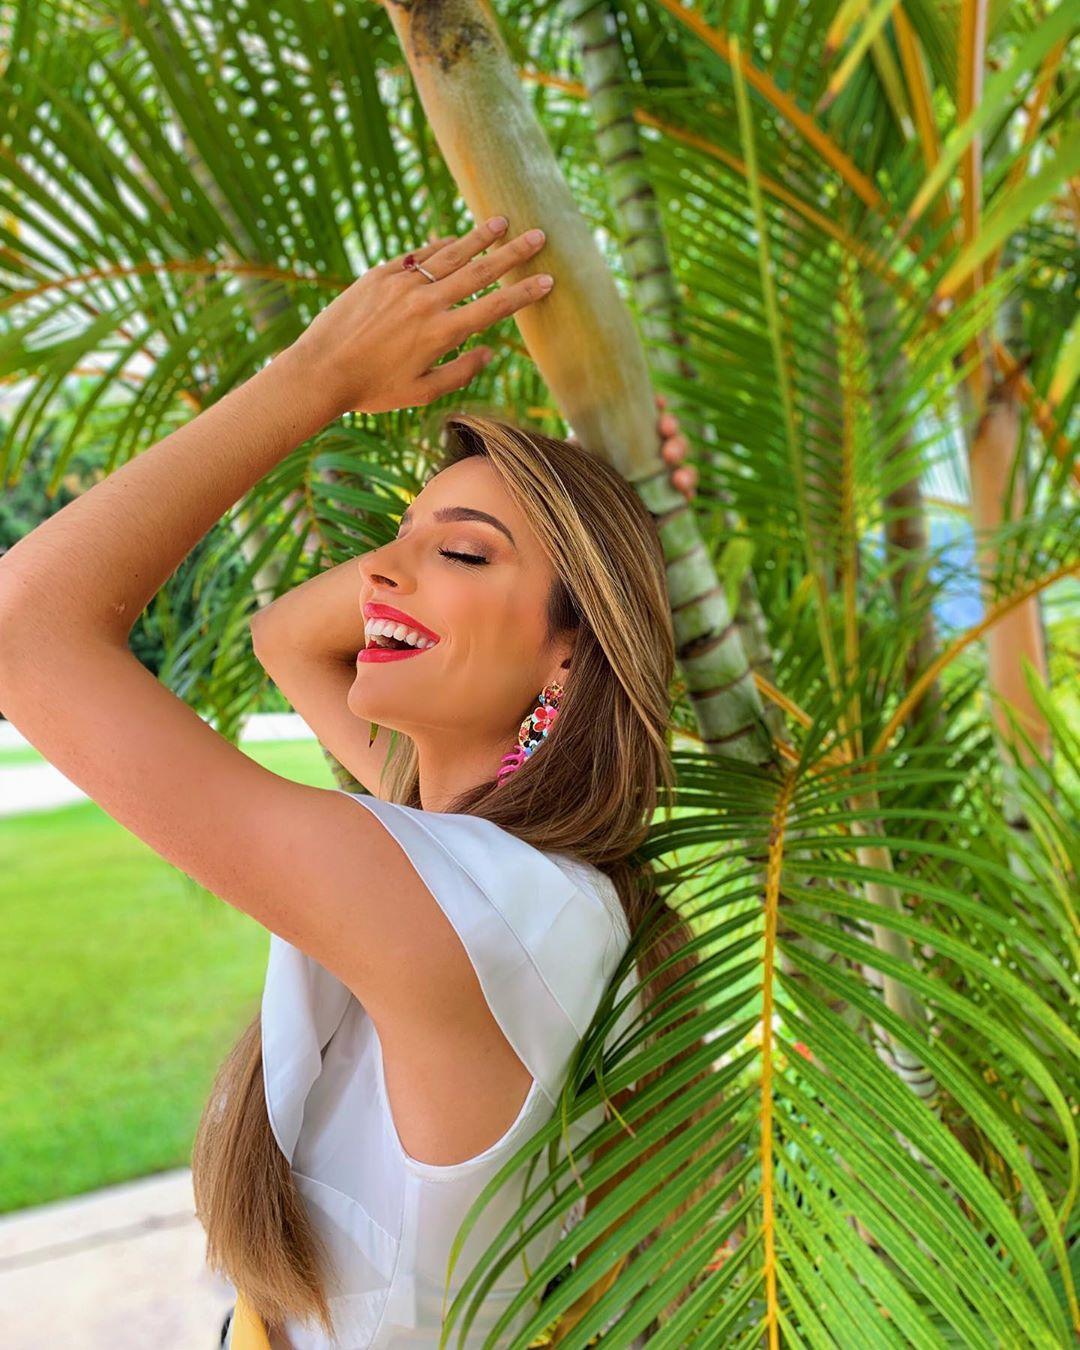 ainara de santamaria villamor, top 21 de miss grand international 2019/miss world cantabria 2018/miss earth spain 2017. - Página 14 70881310